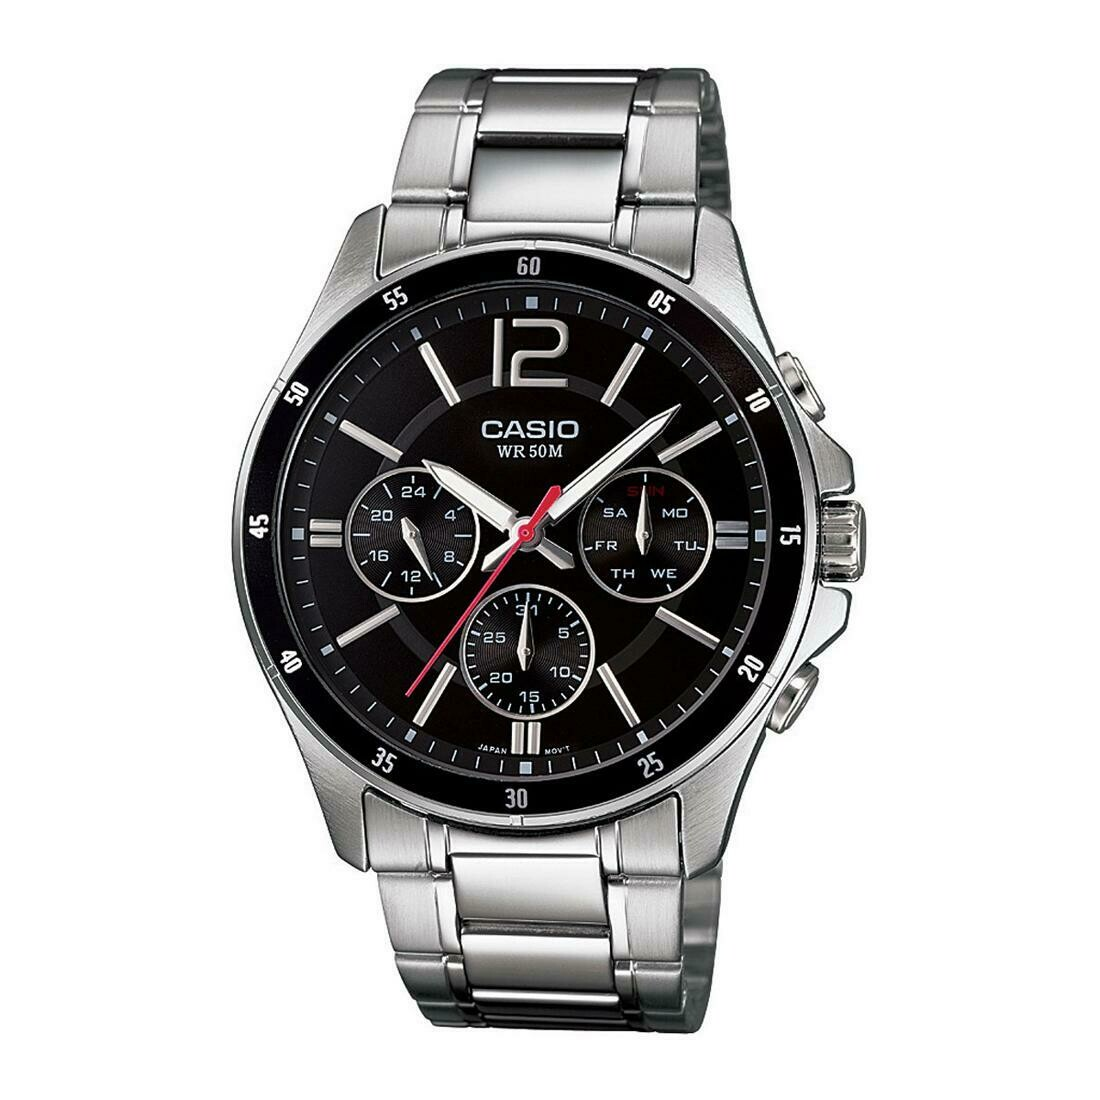 Casio Enticer MTP-1374D-1AVDF Analog Wrist Watch For Men - Silver